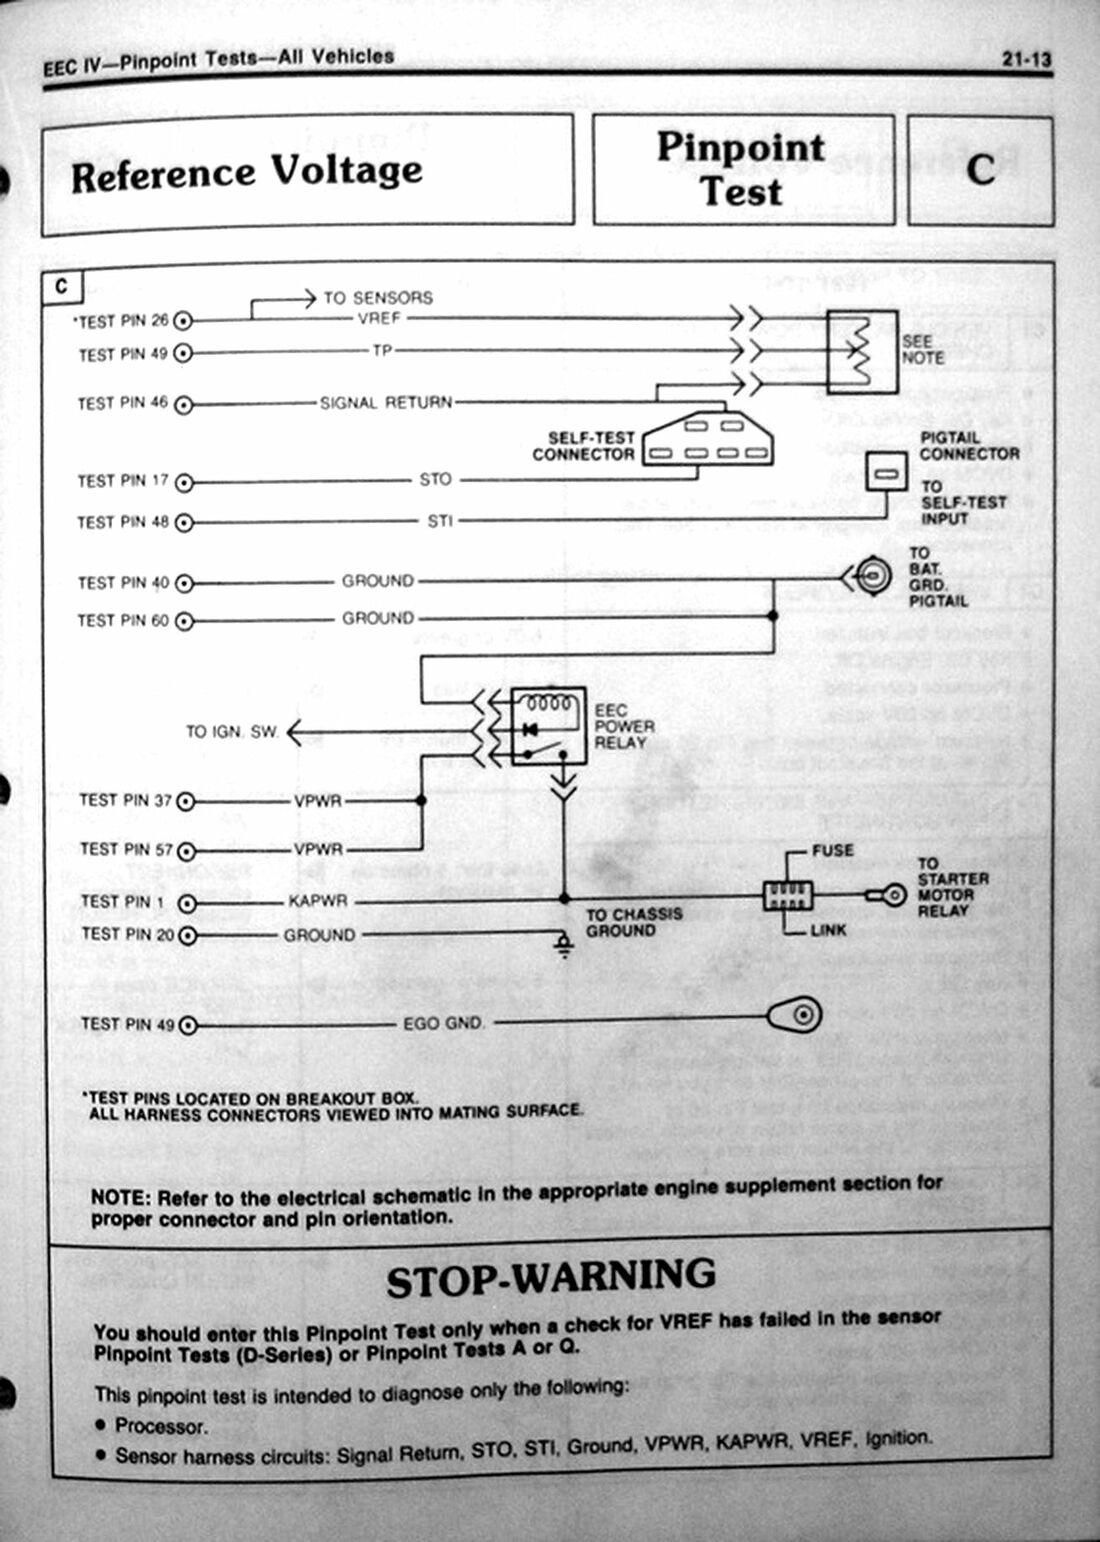 medium resolution of eec iv wiring diagram 4 9 advance wiring diagram eec iv wiring diagram 4 9